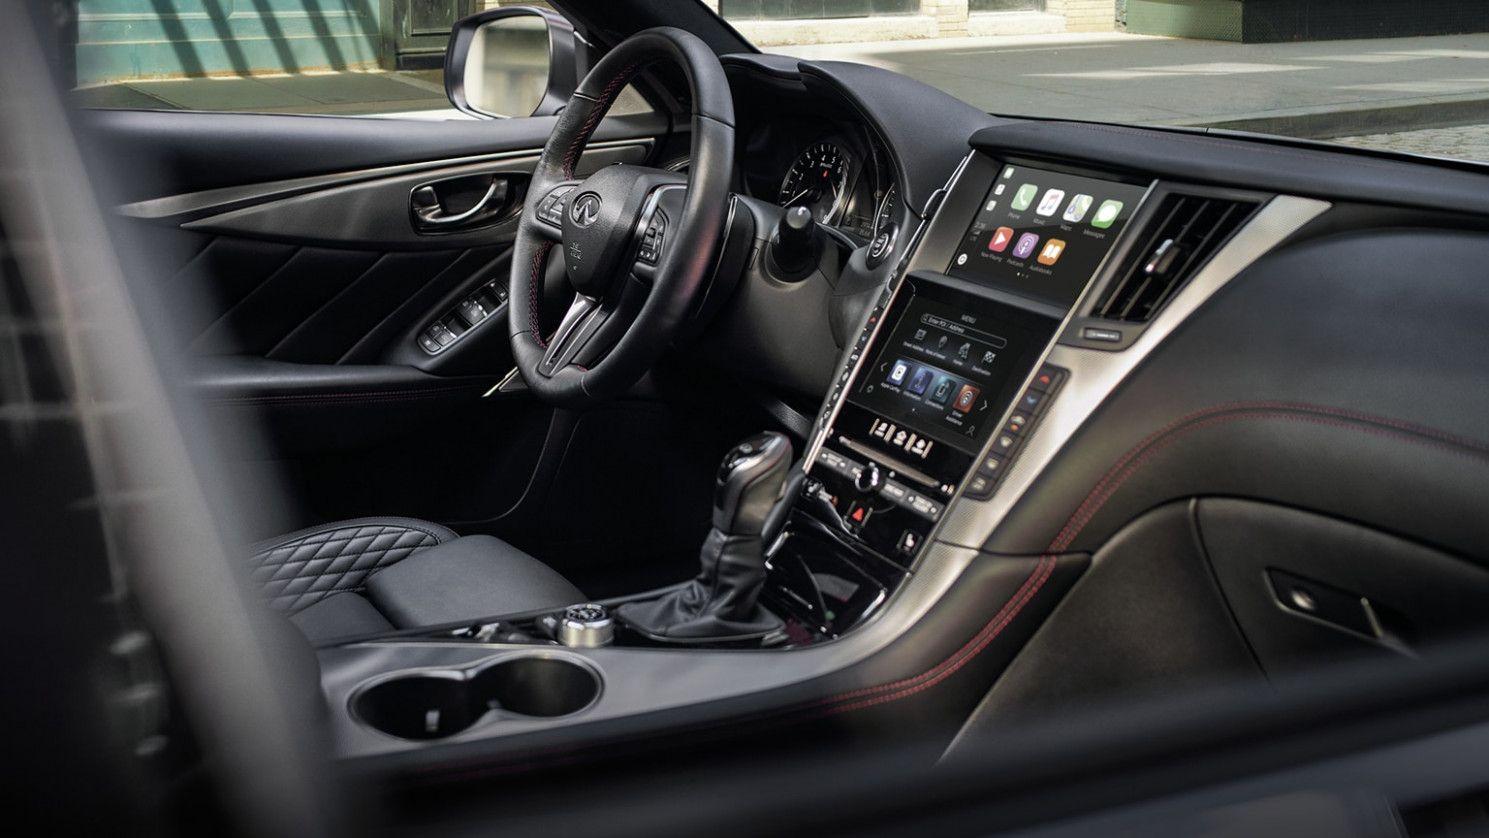 7 Image 2020 Infiniti Hybrid in 2020 Infiniti q50